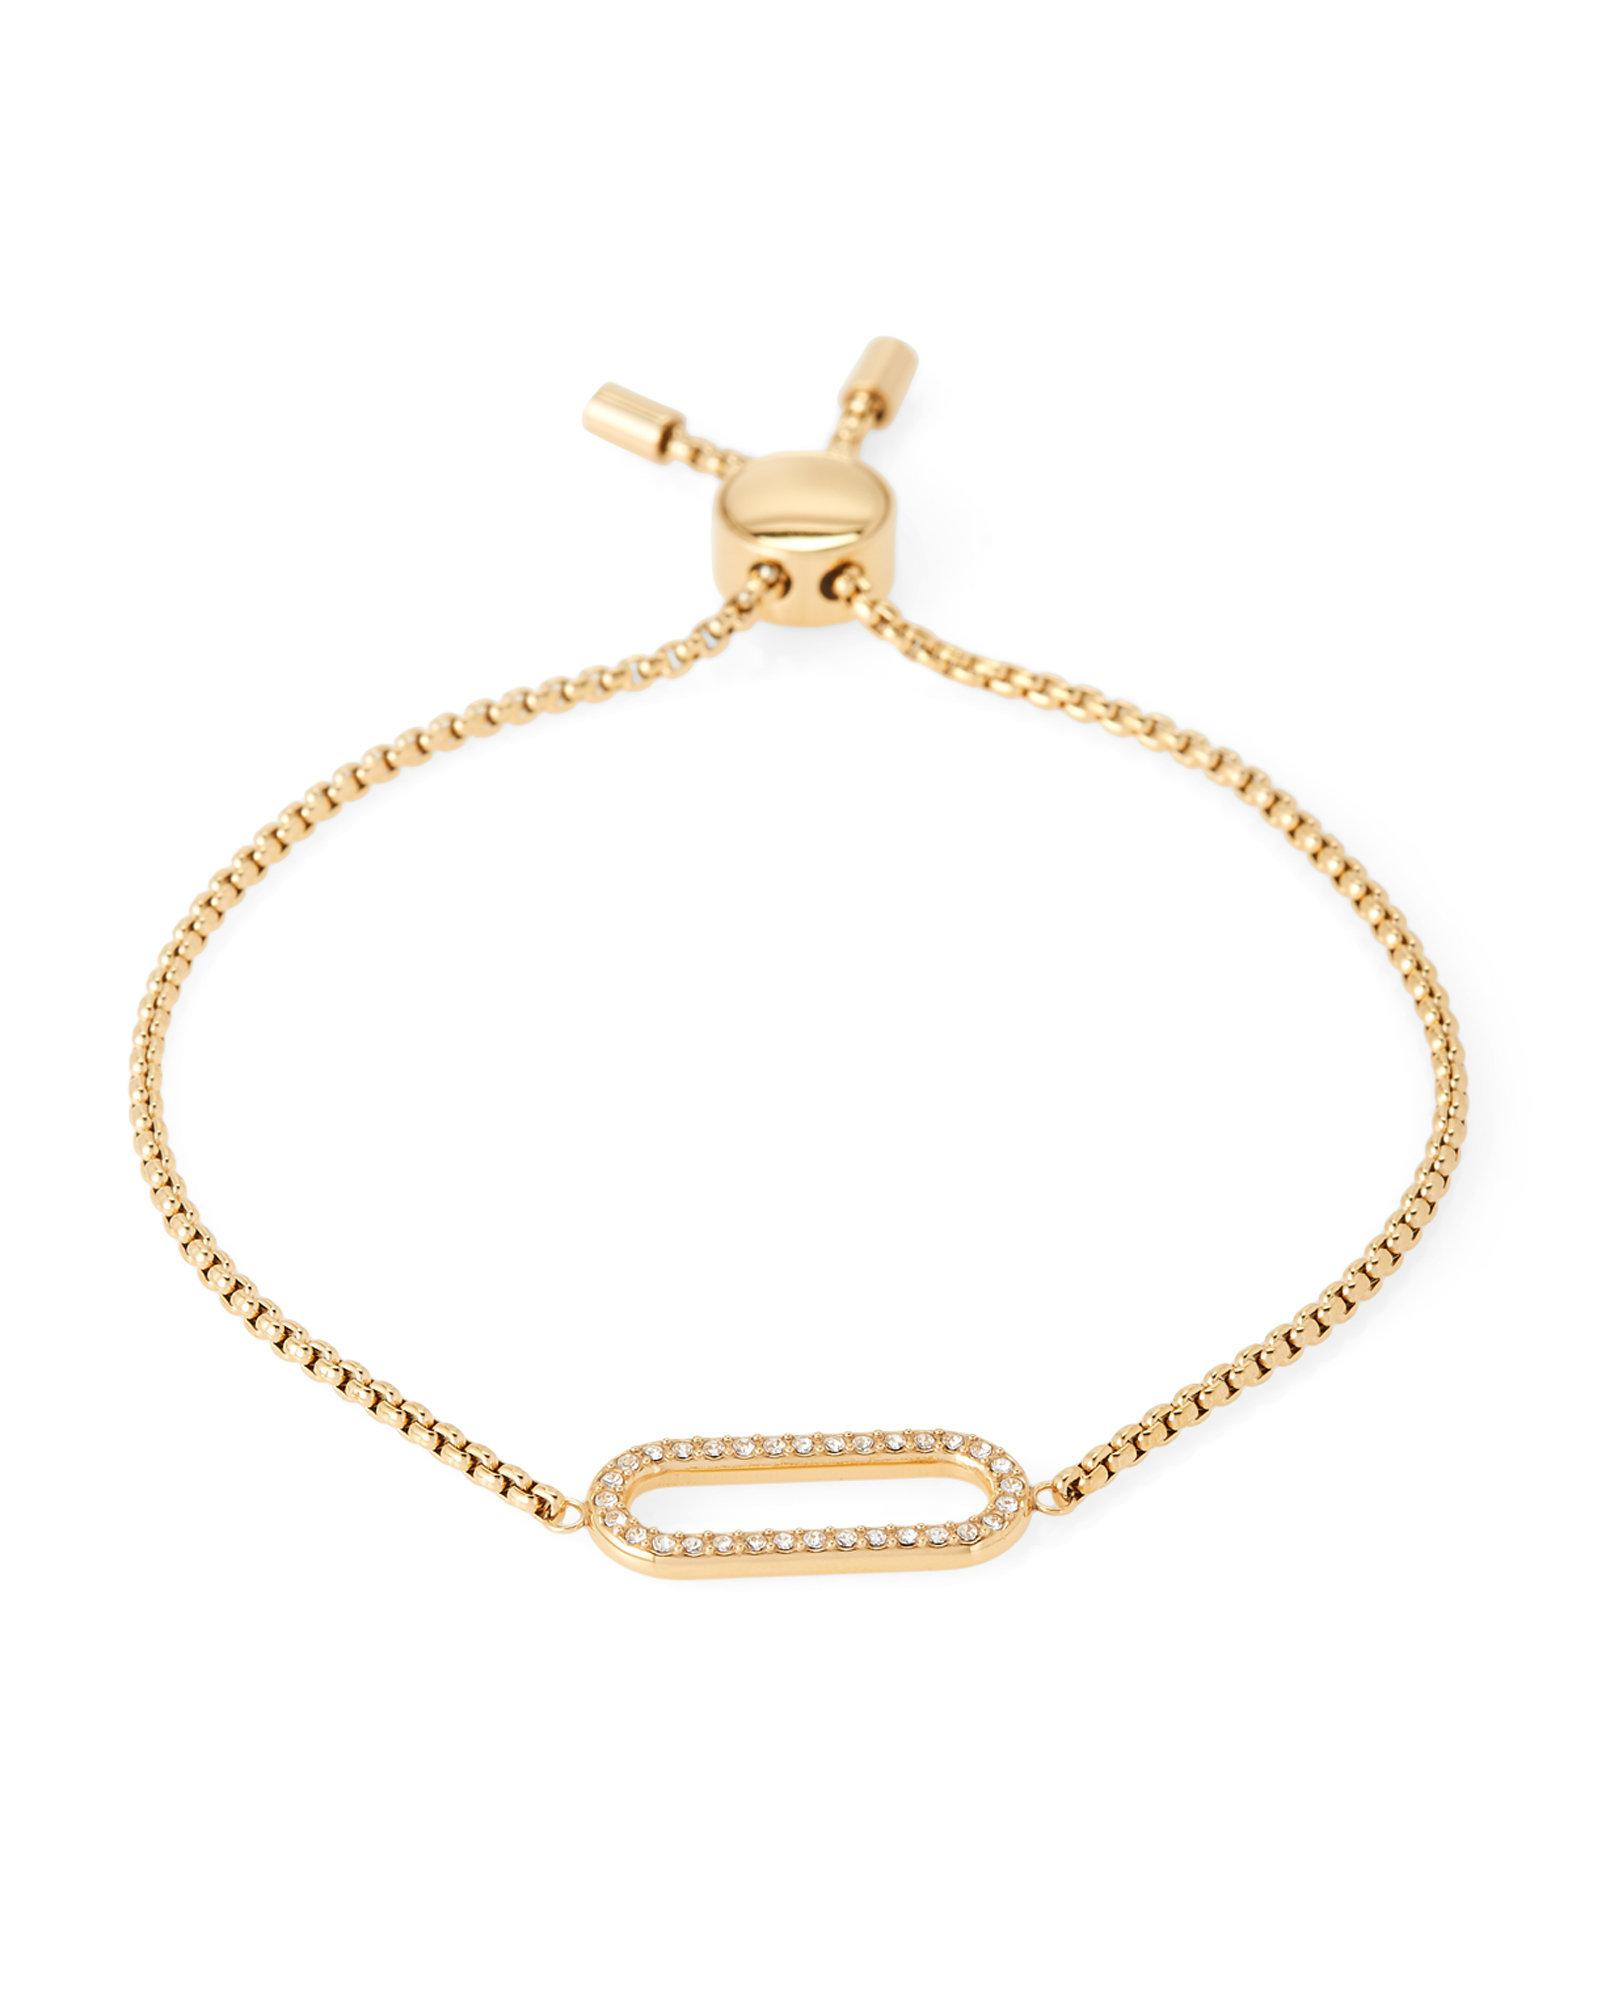 64e3a2741599 Lyst - Michael Kors Gold-tone Pave Link Slider Bracelet in Metallic